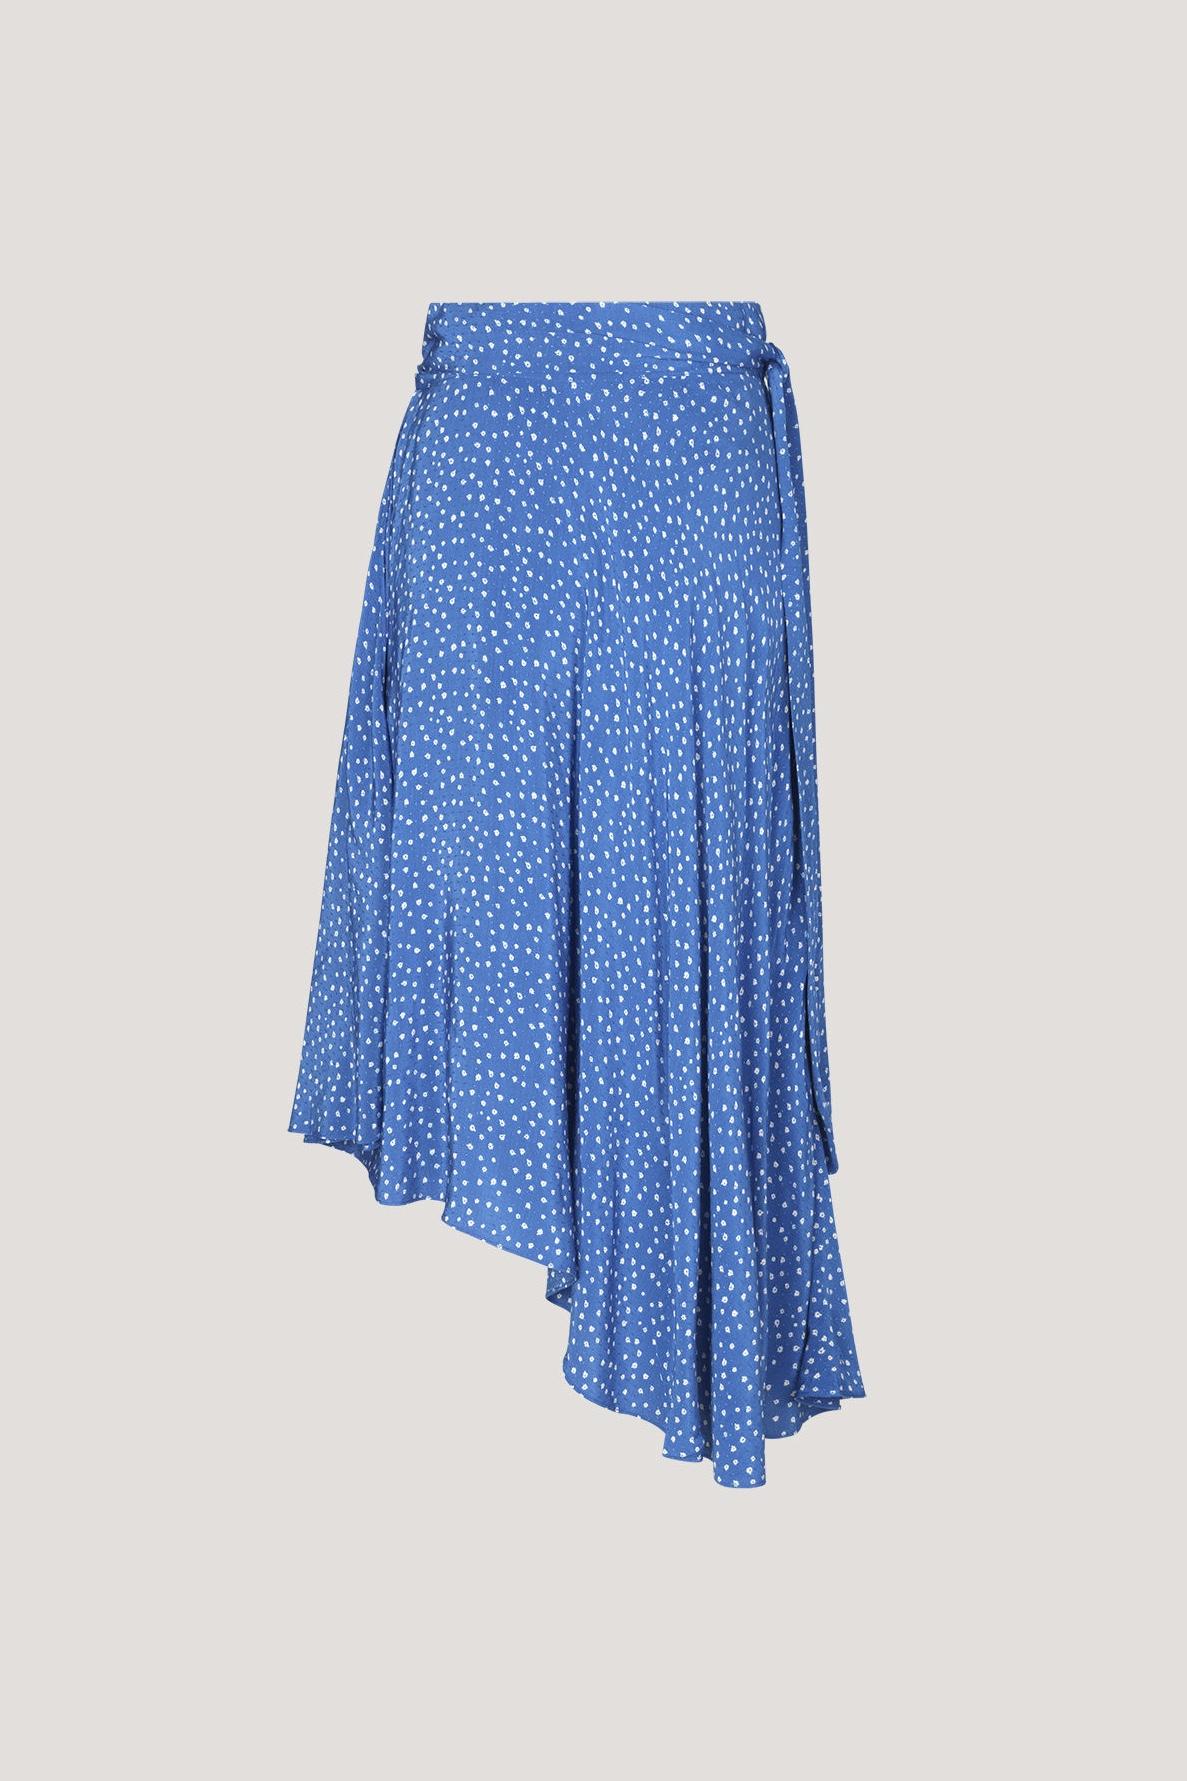 d183485601 Home / Woman / Skirts & Shorts / Chila Skirt